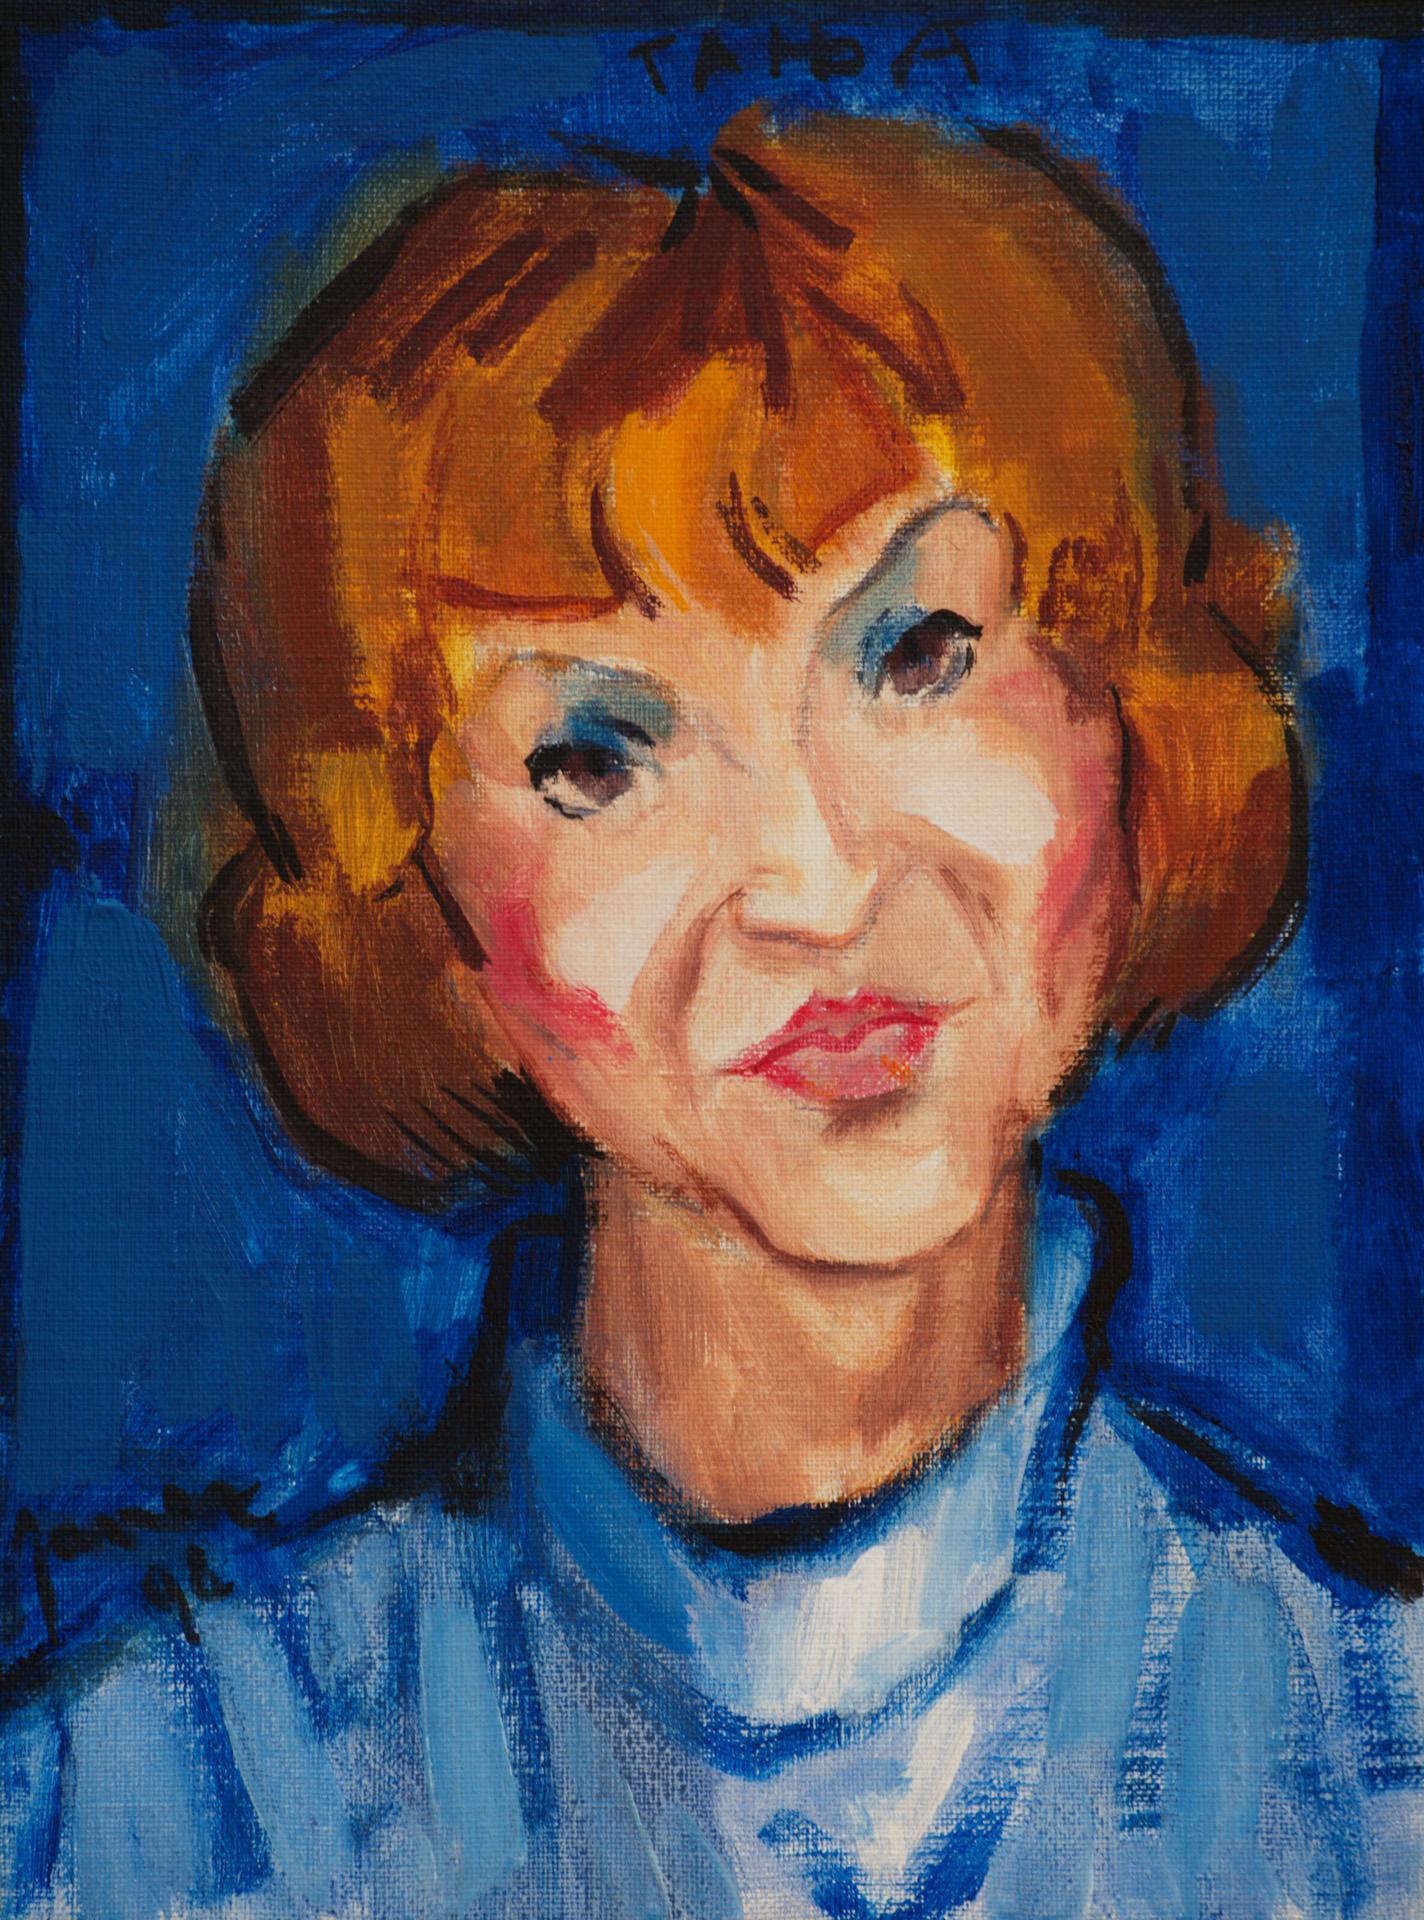 1998_portrait_30x40cm_Tanja.jpg